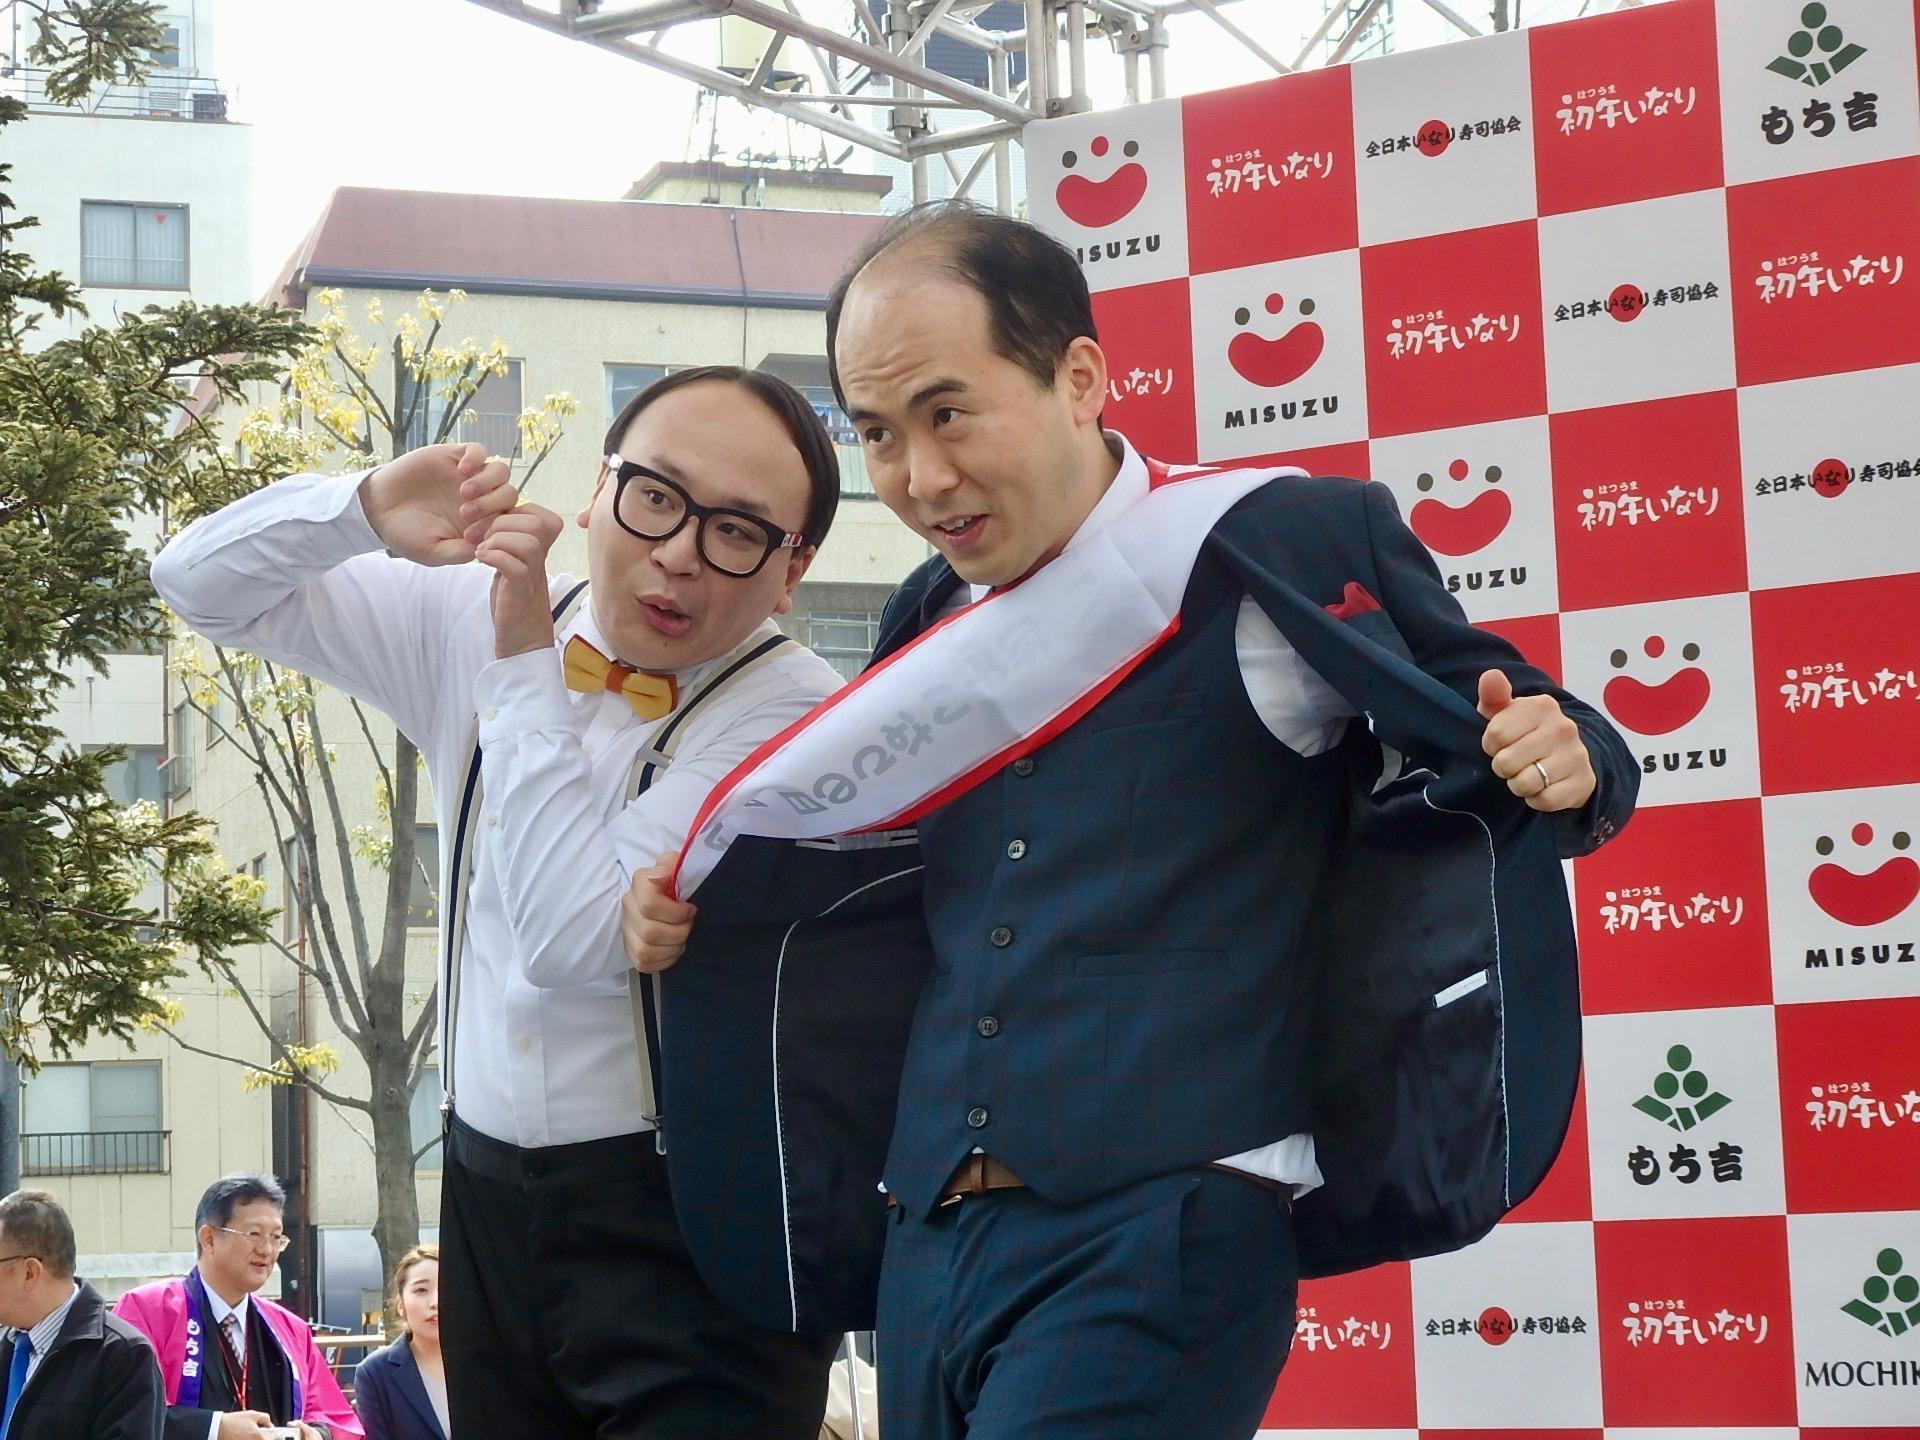 http://news.yoshimoto.co.jp/20180210164203-ede073685bb0a53b707334c040e27a81676ad103.jpg